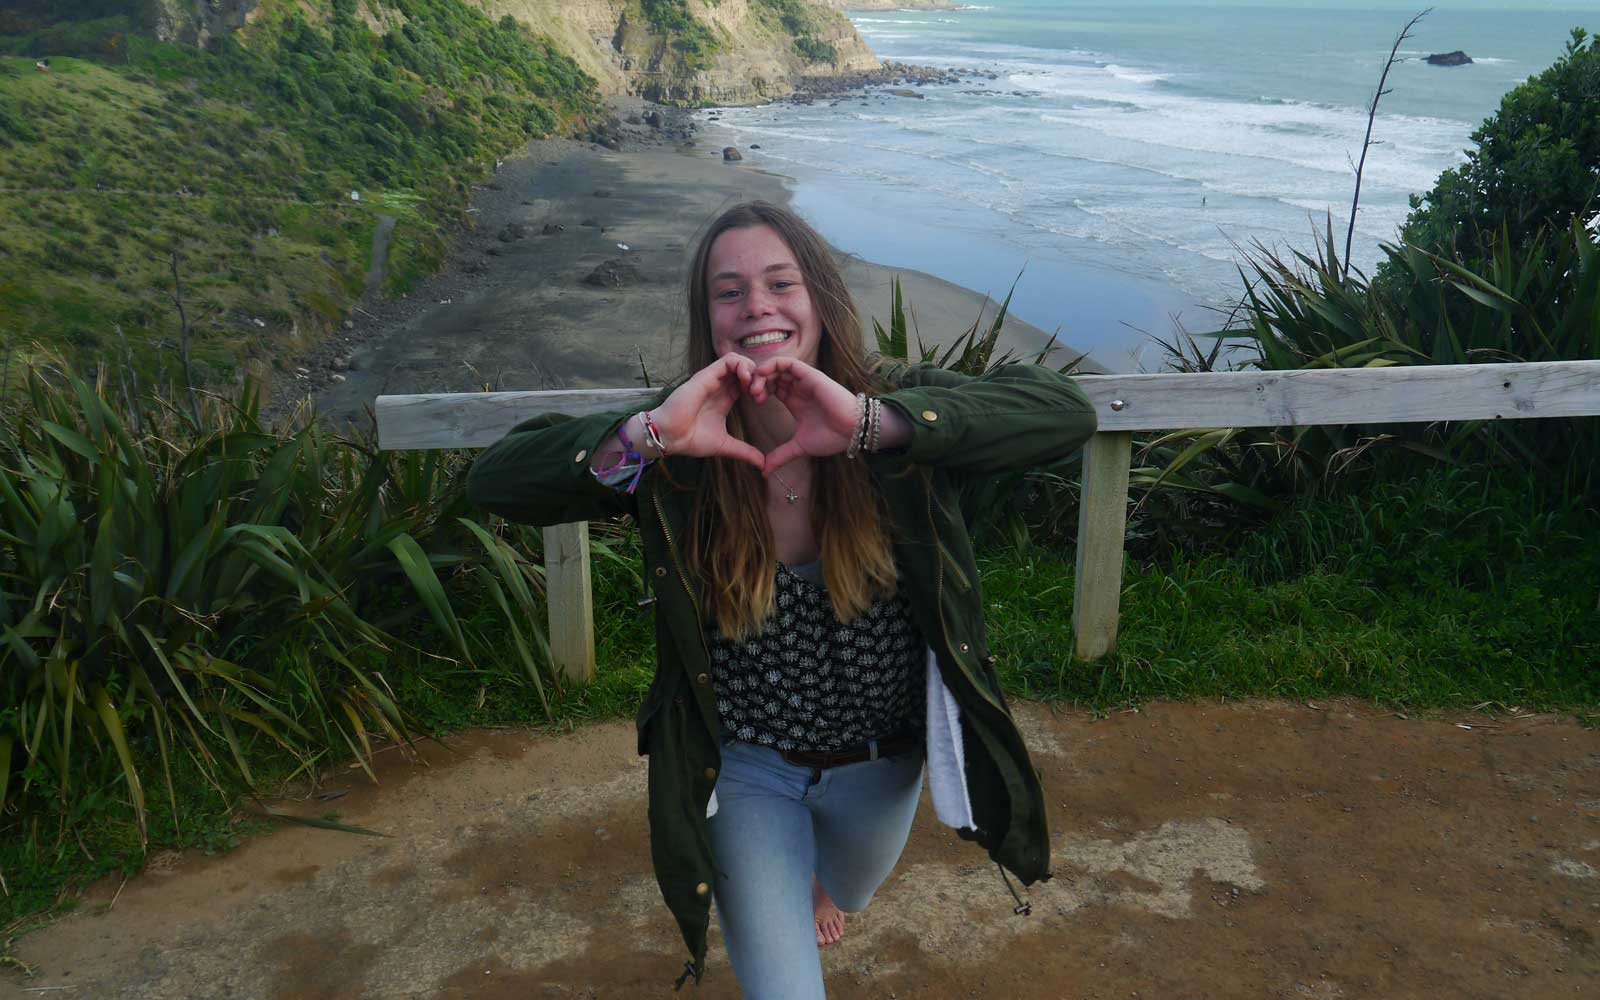 Stipendiatin Miriam in Neuseeland